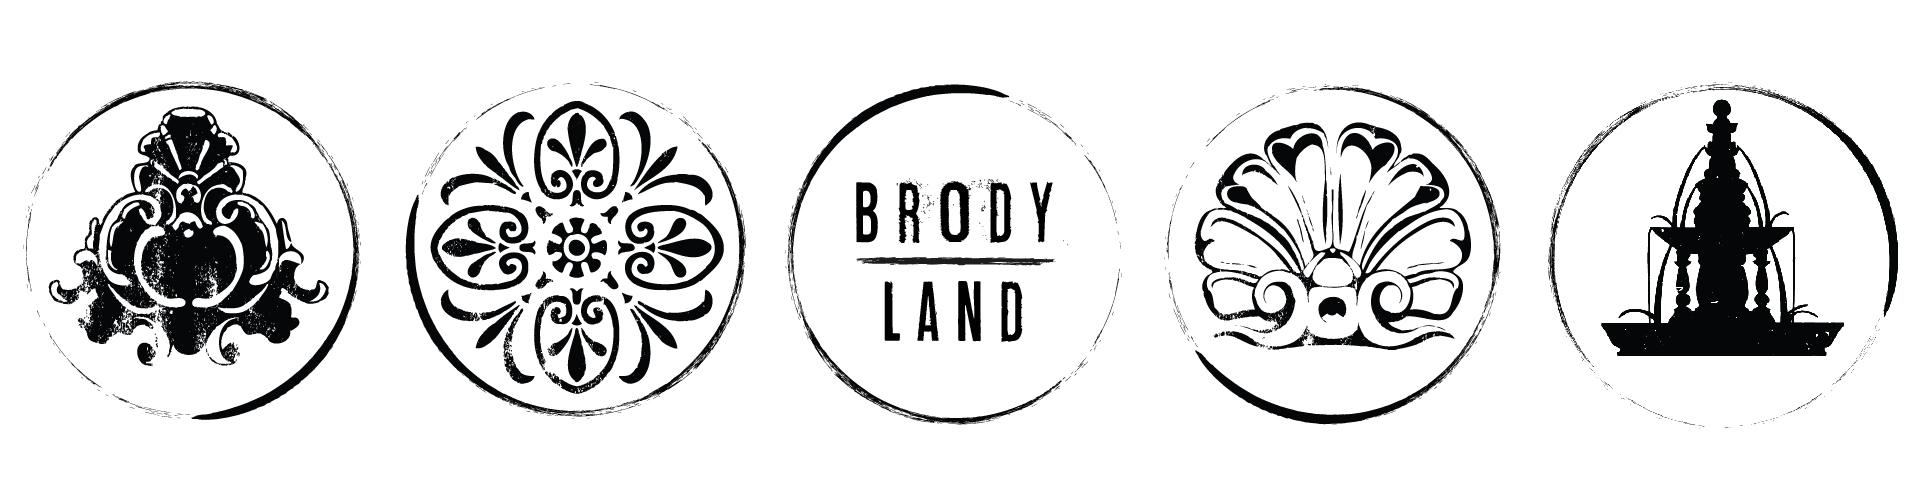 BL-venues-logo-05.jpg